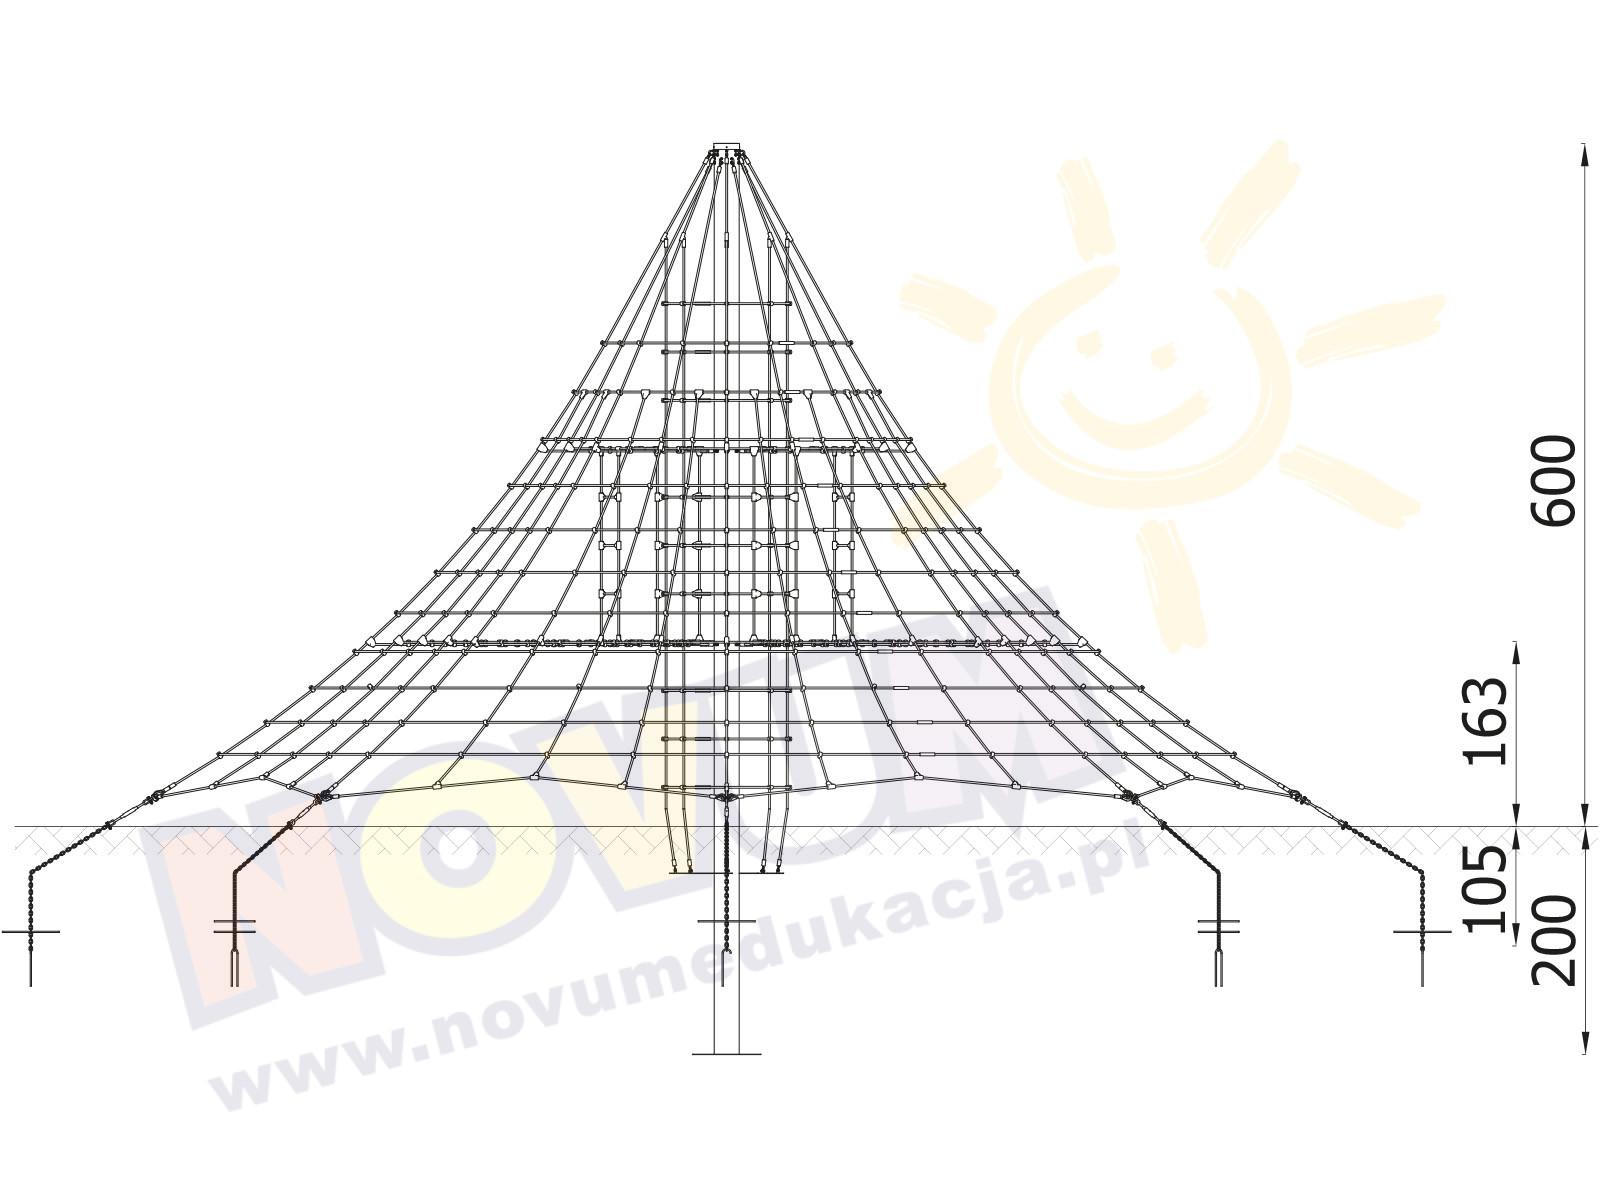 Linarium Wielka Piramida